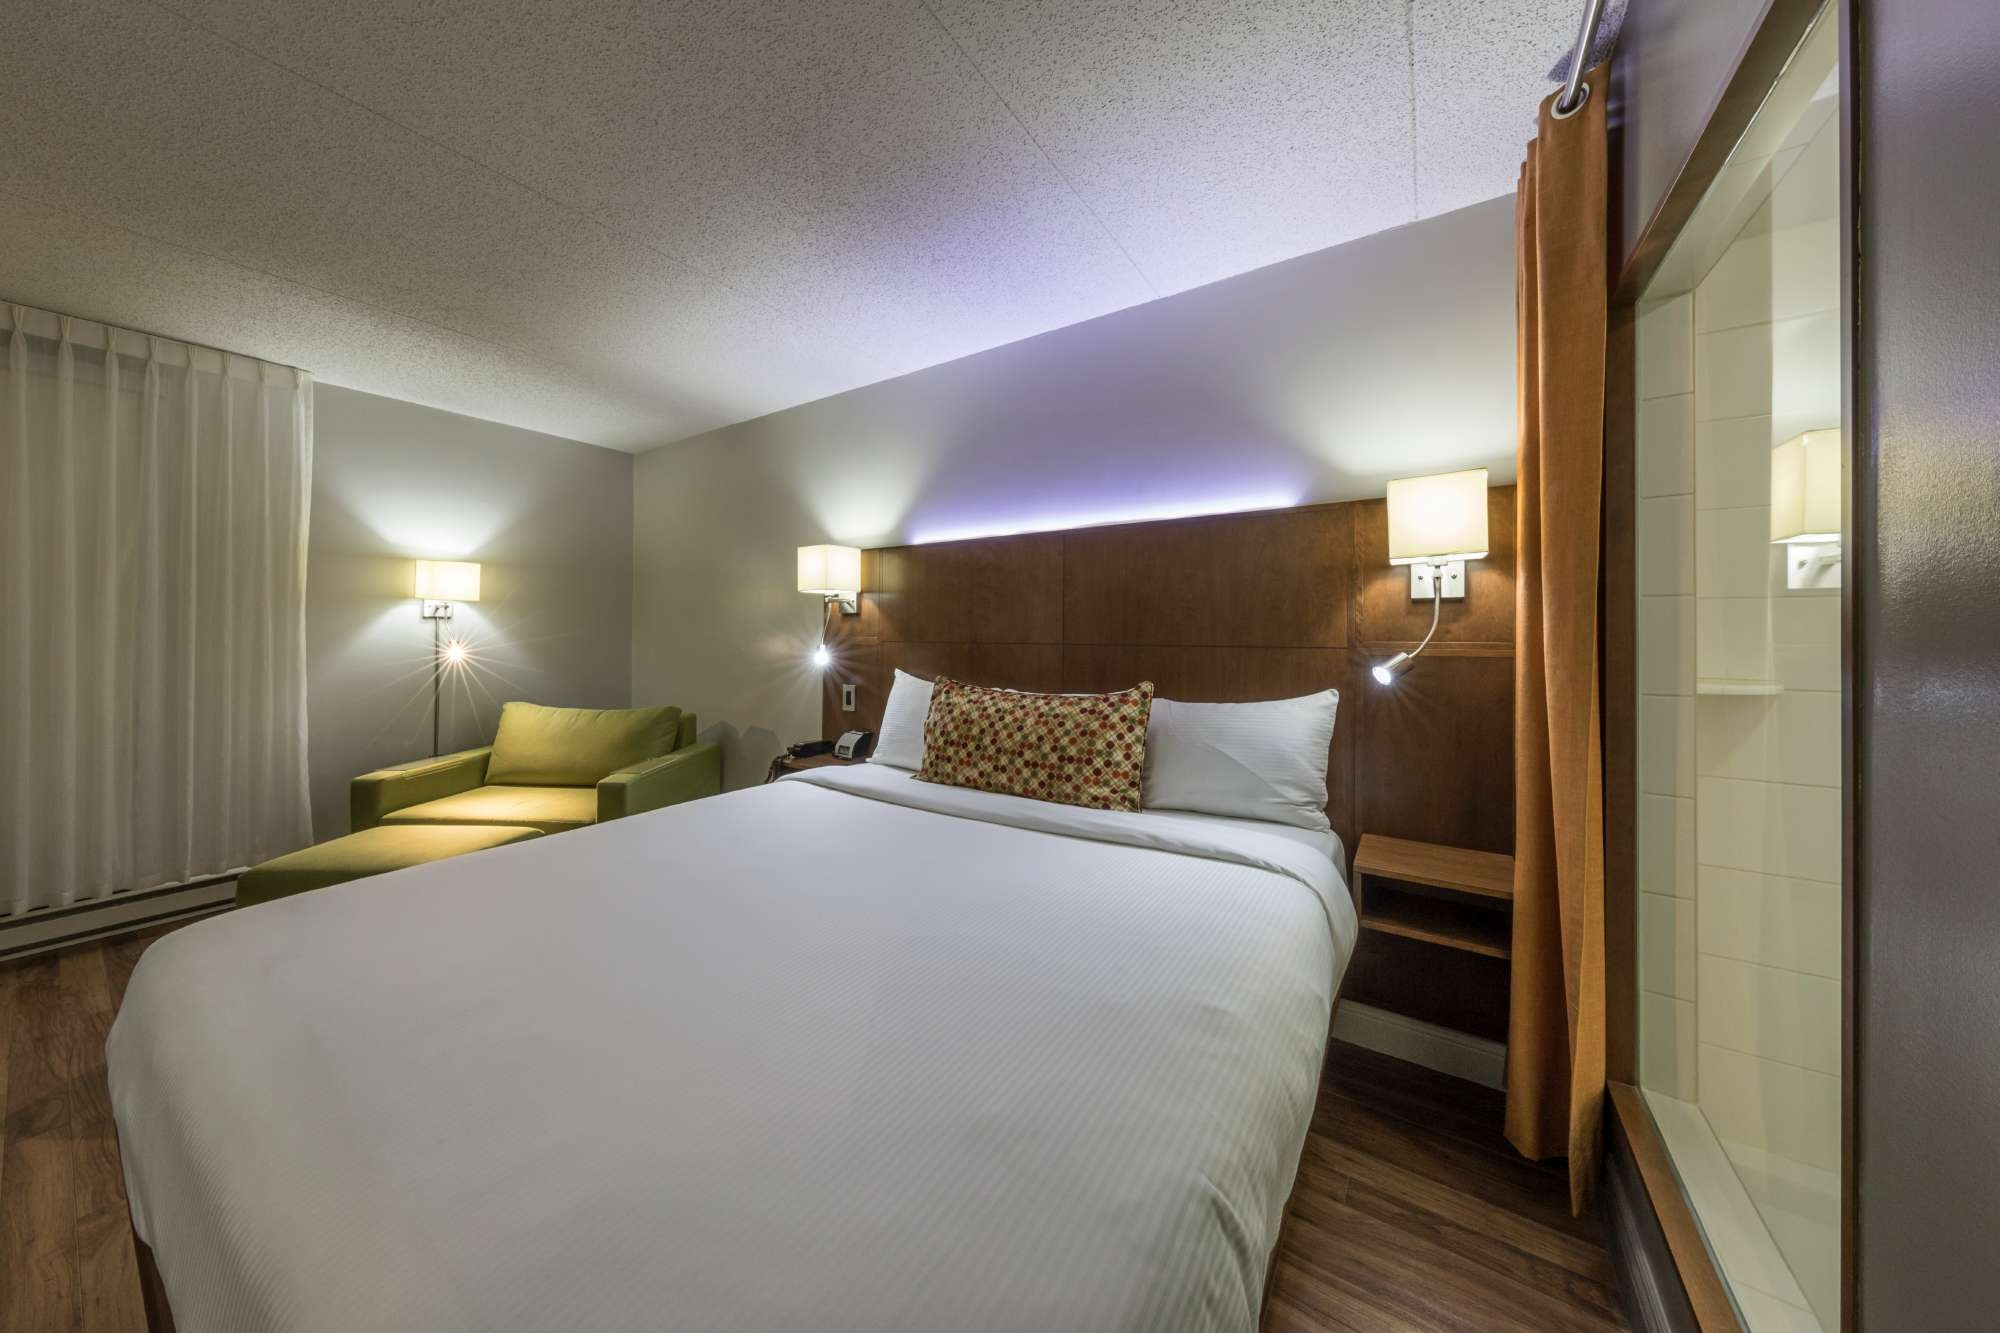 H Tel Et Suites Normandin Hotel In Quebec City # Support Tv Escamotable